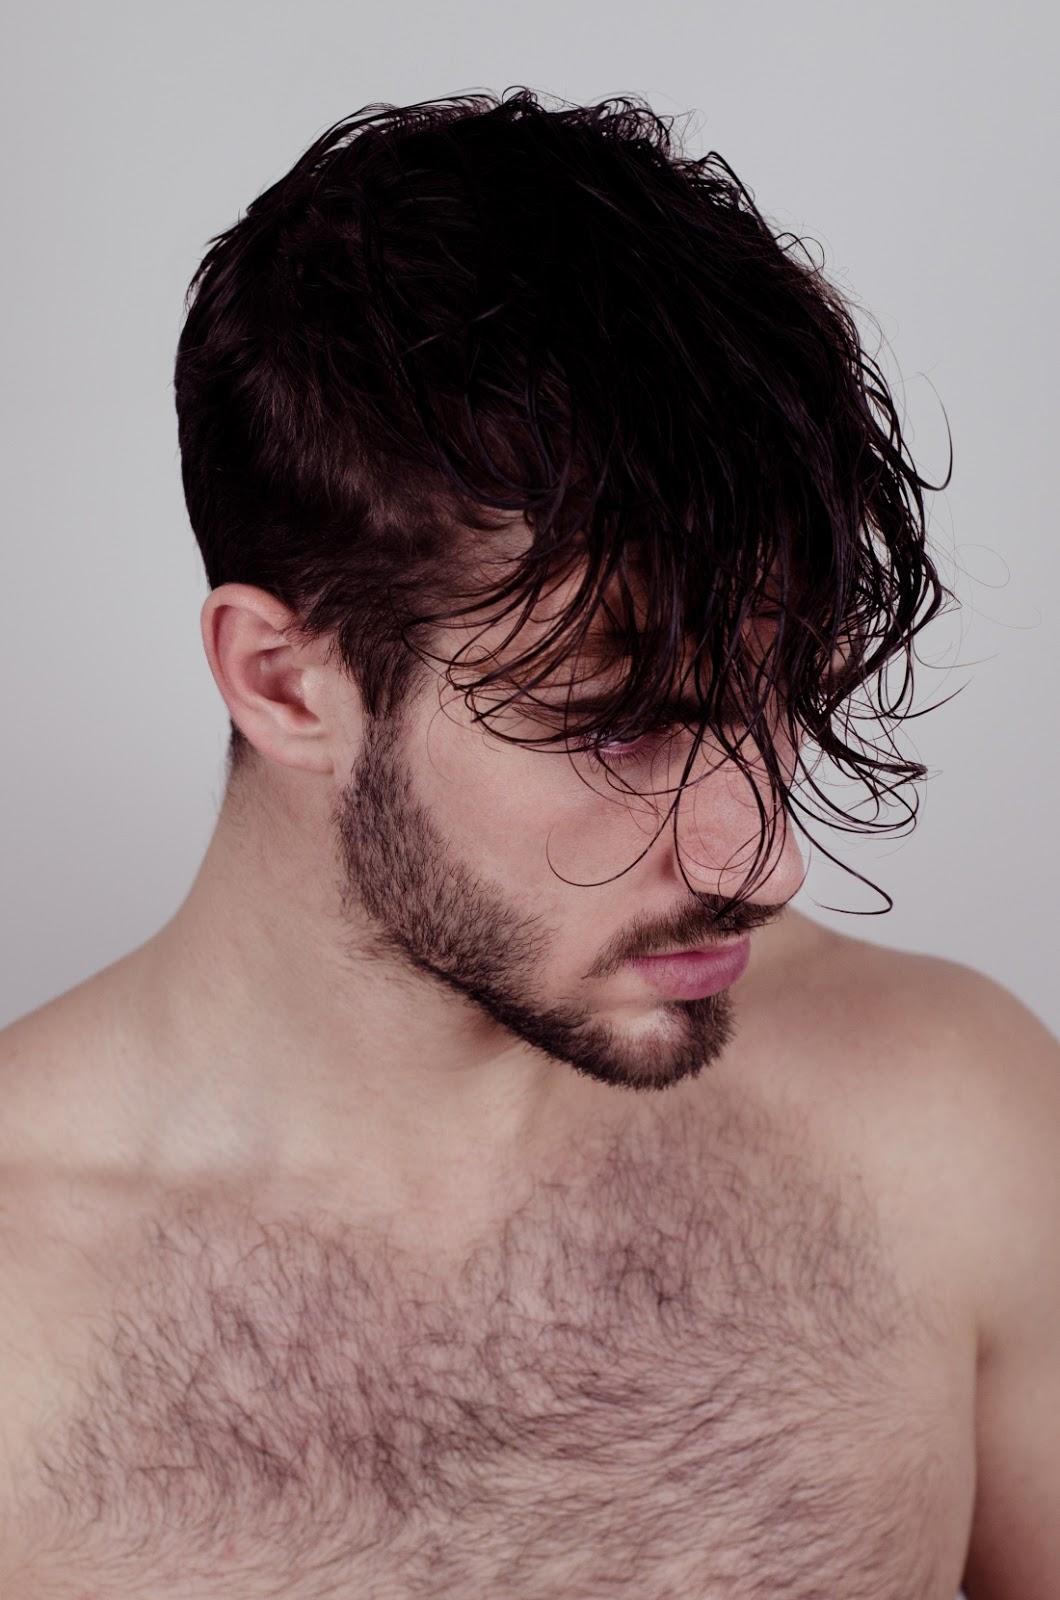 Male lack facial hair petite